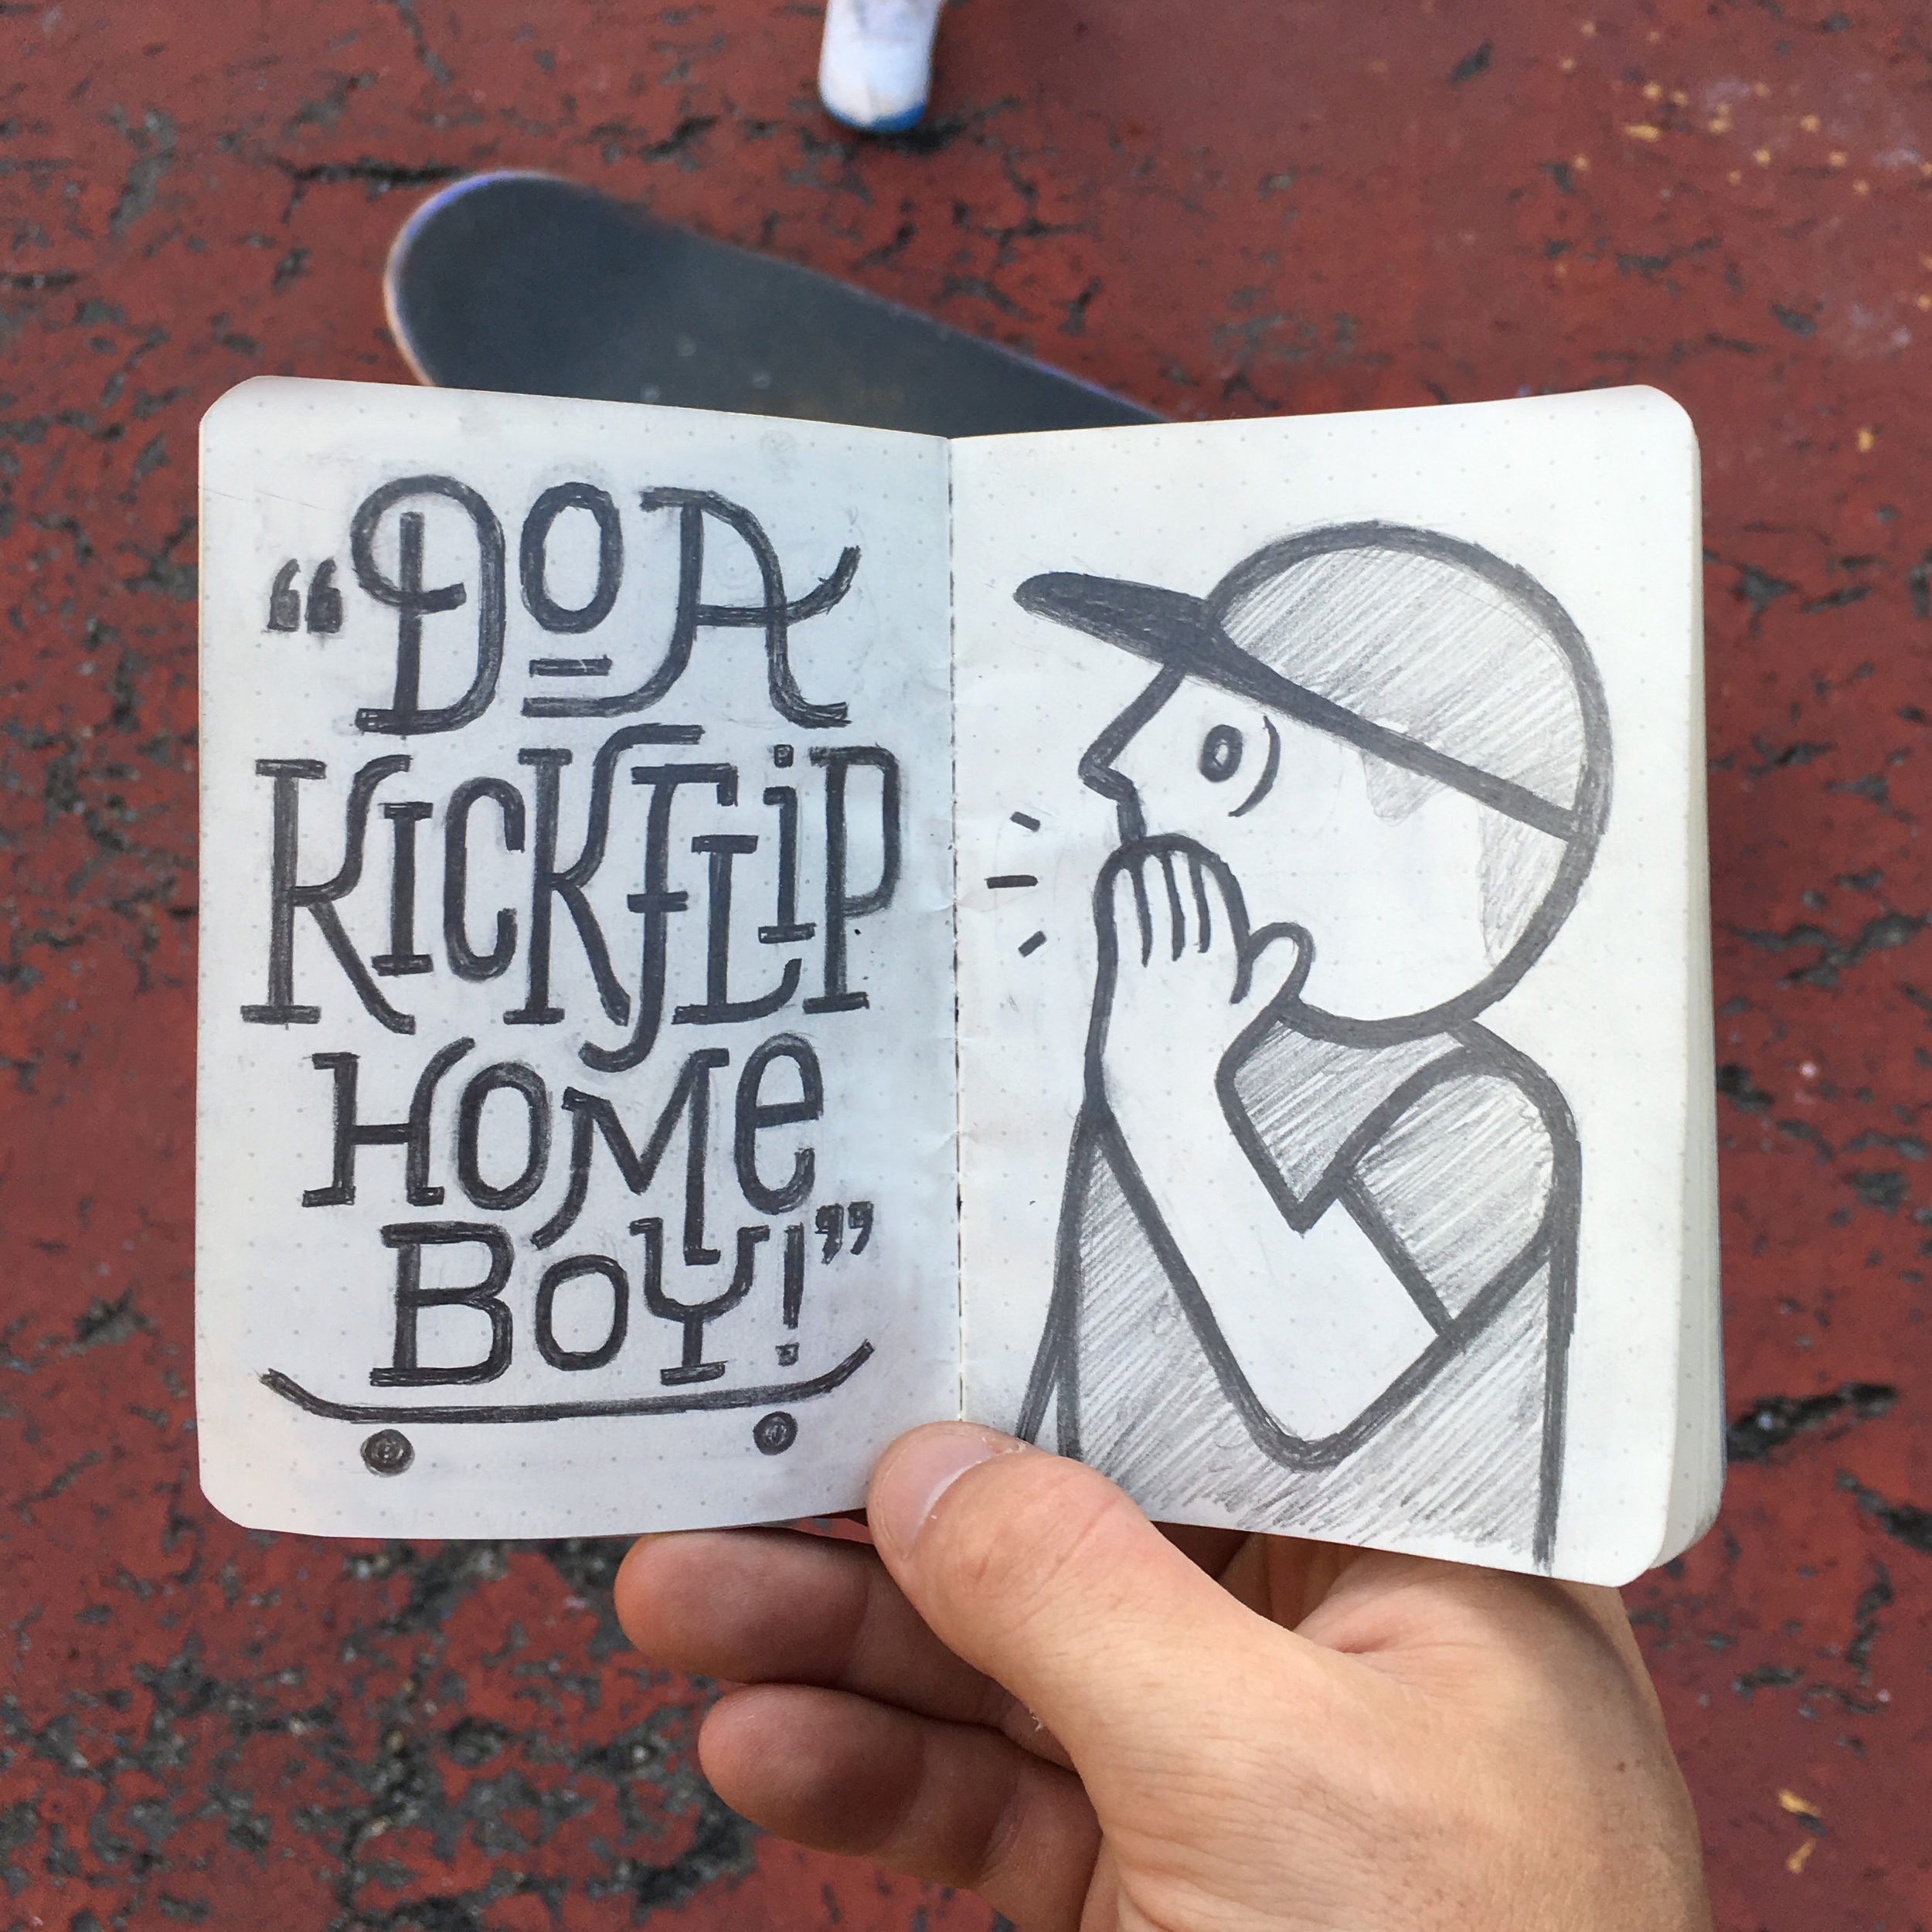 kickfliphomeboy-1.jpg